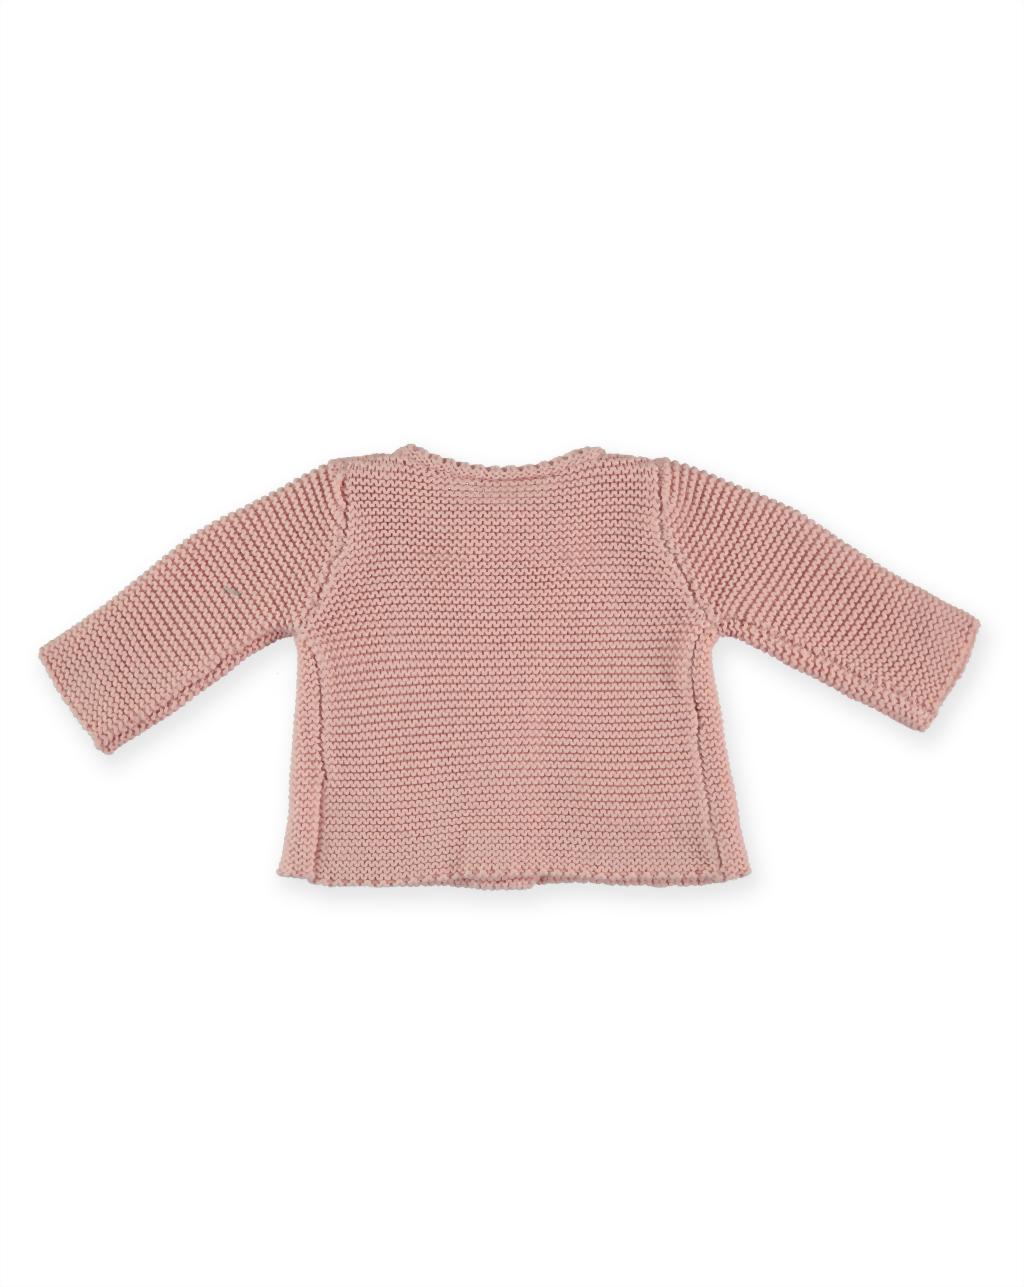 Pan con Chocolate: Chaqueta tricot Tula